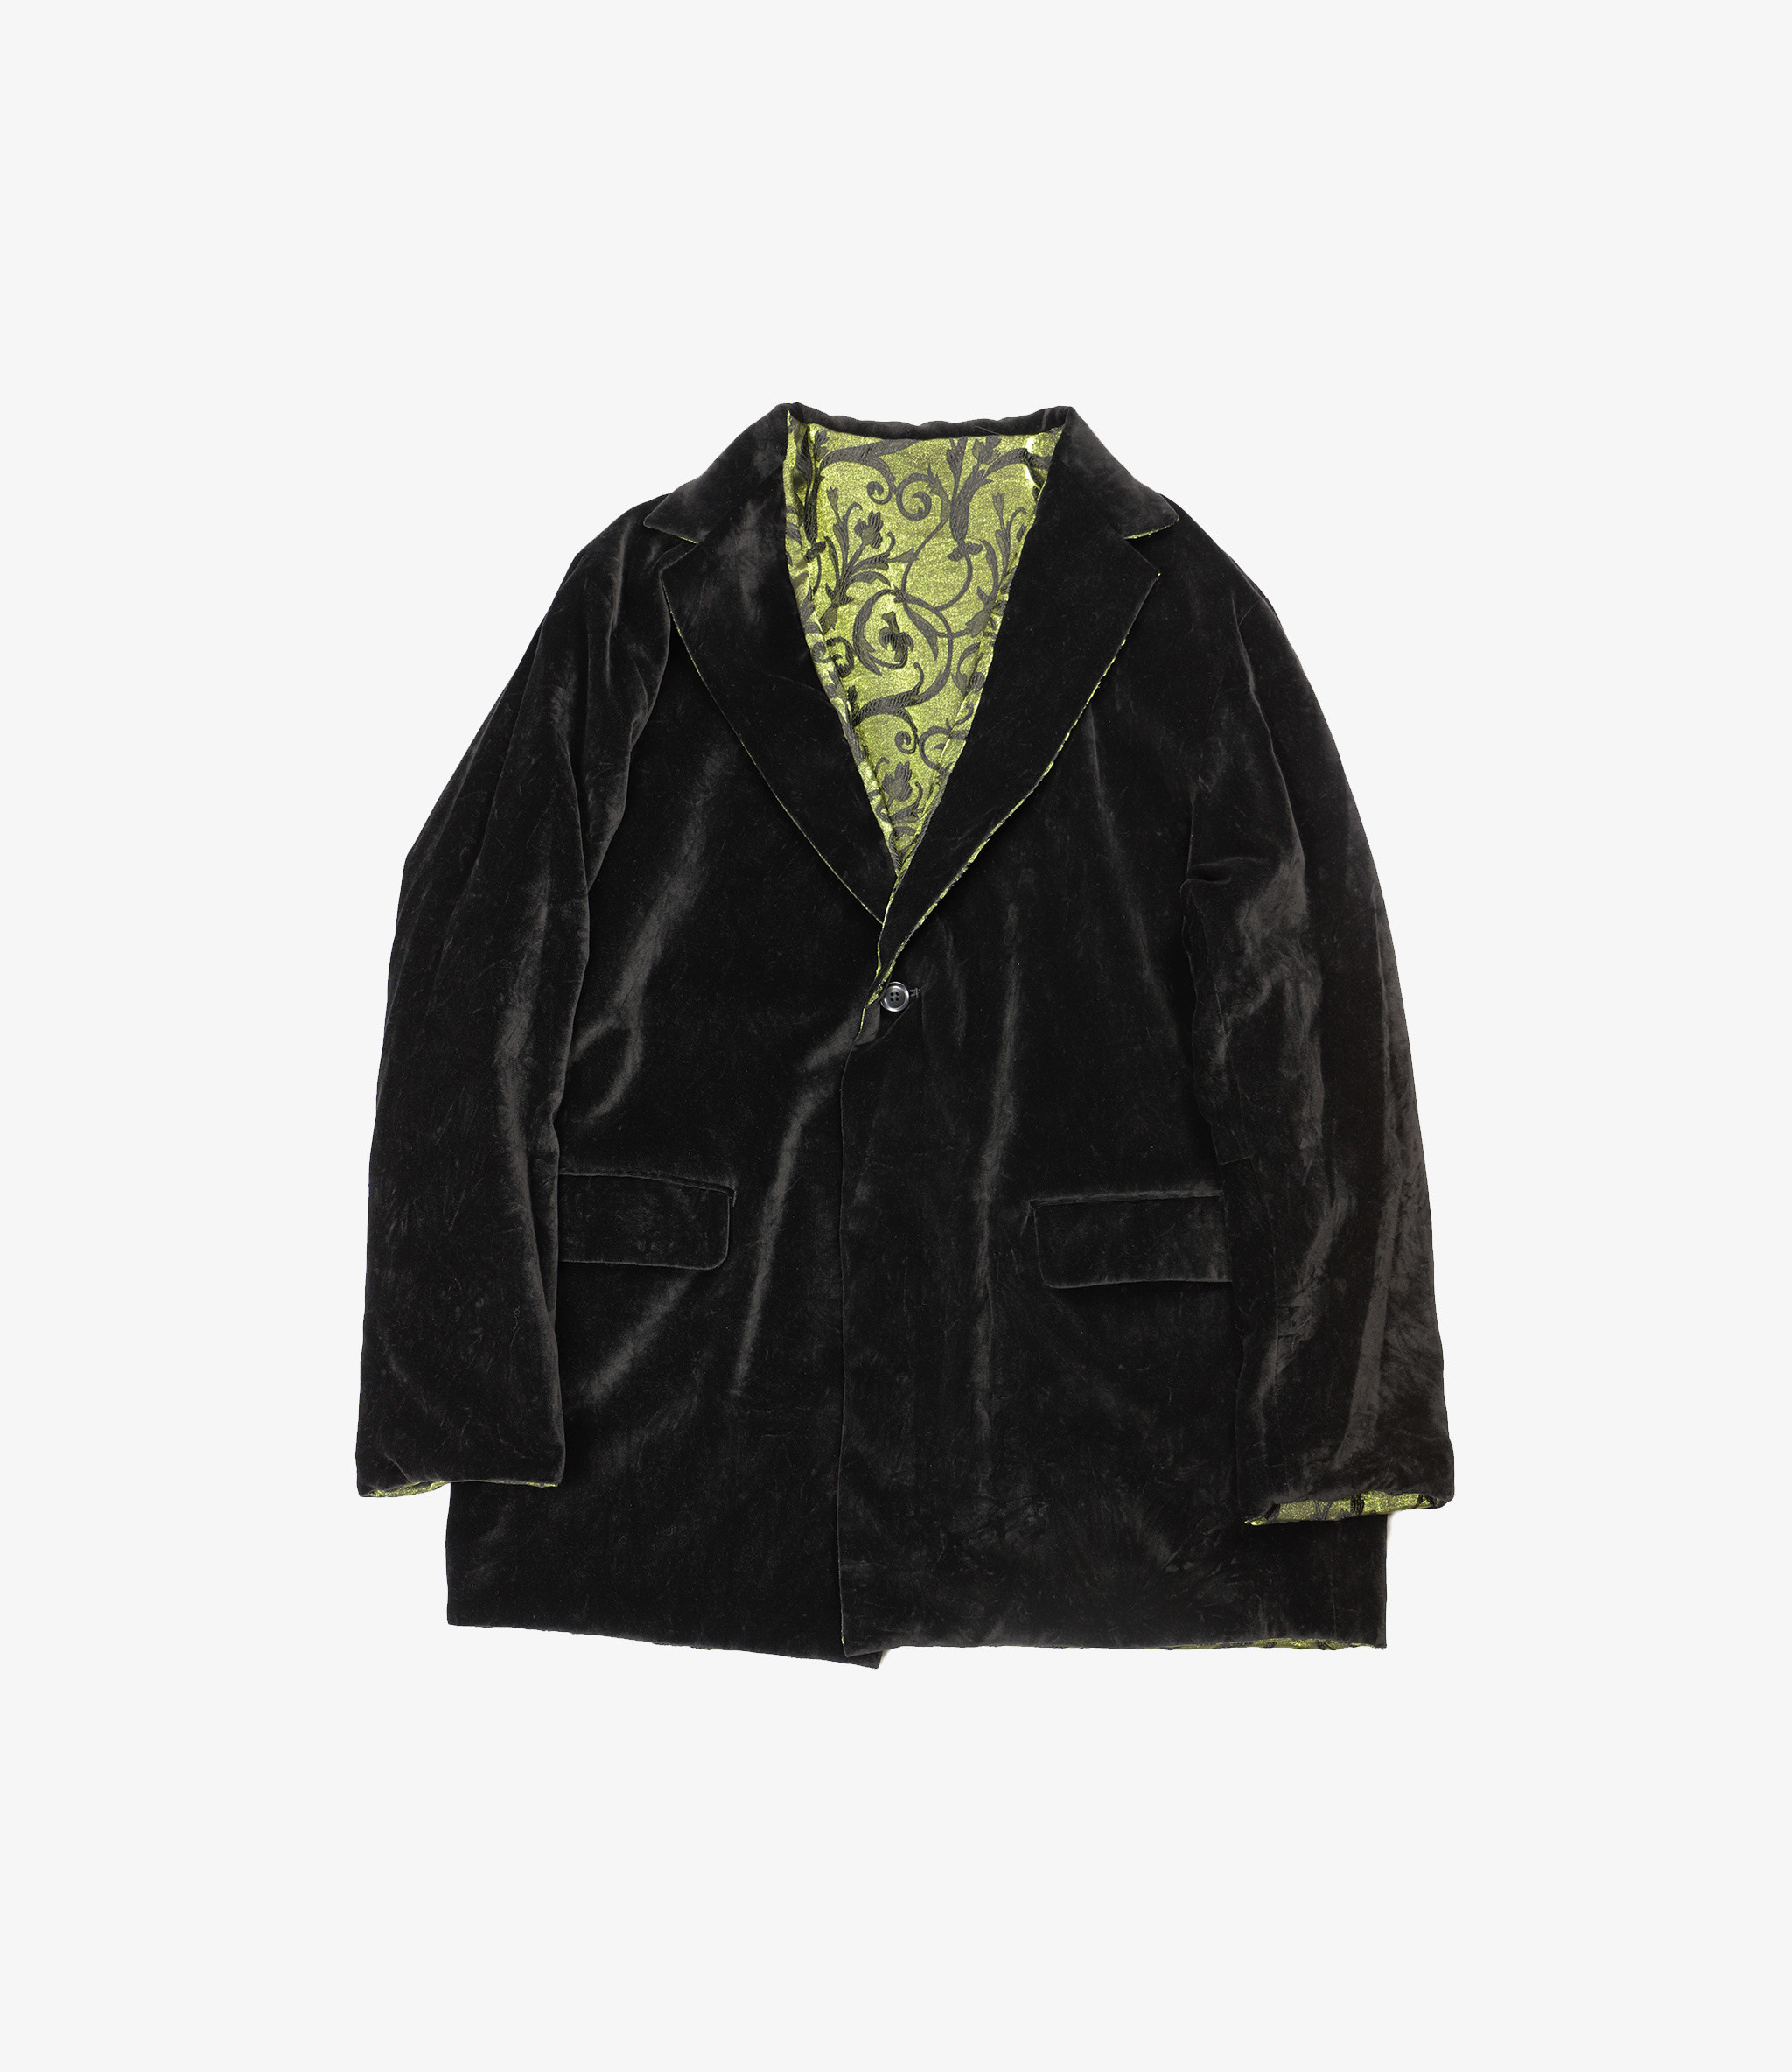 Needles Rev. 1B Jacket - Arabesque Jacquard - Green